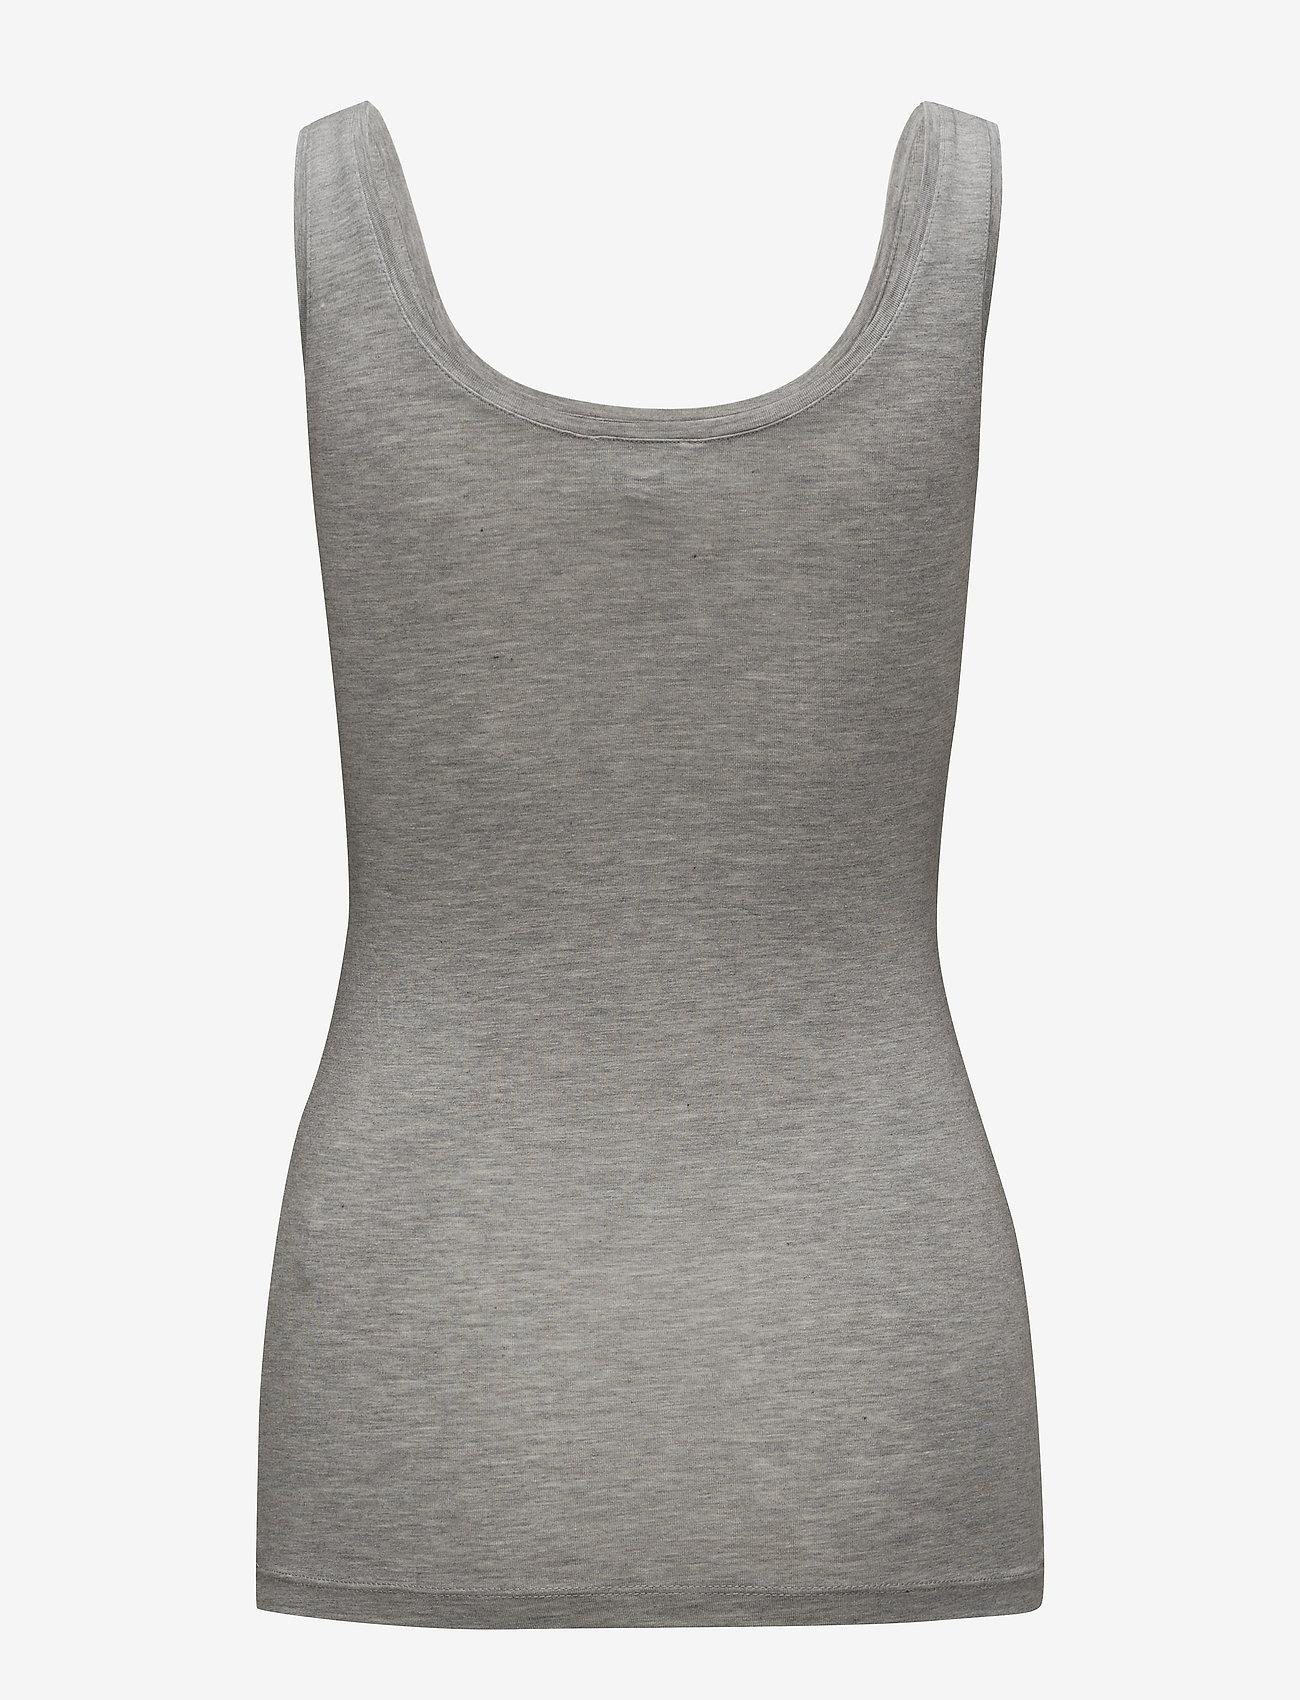 mbyM - Sina - sleeveless tops - light grey melange - 1